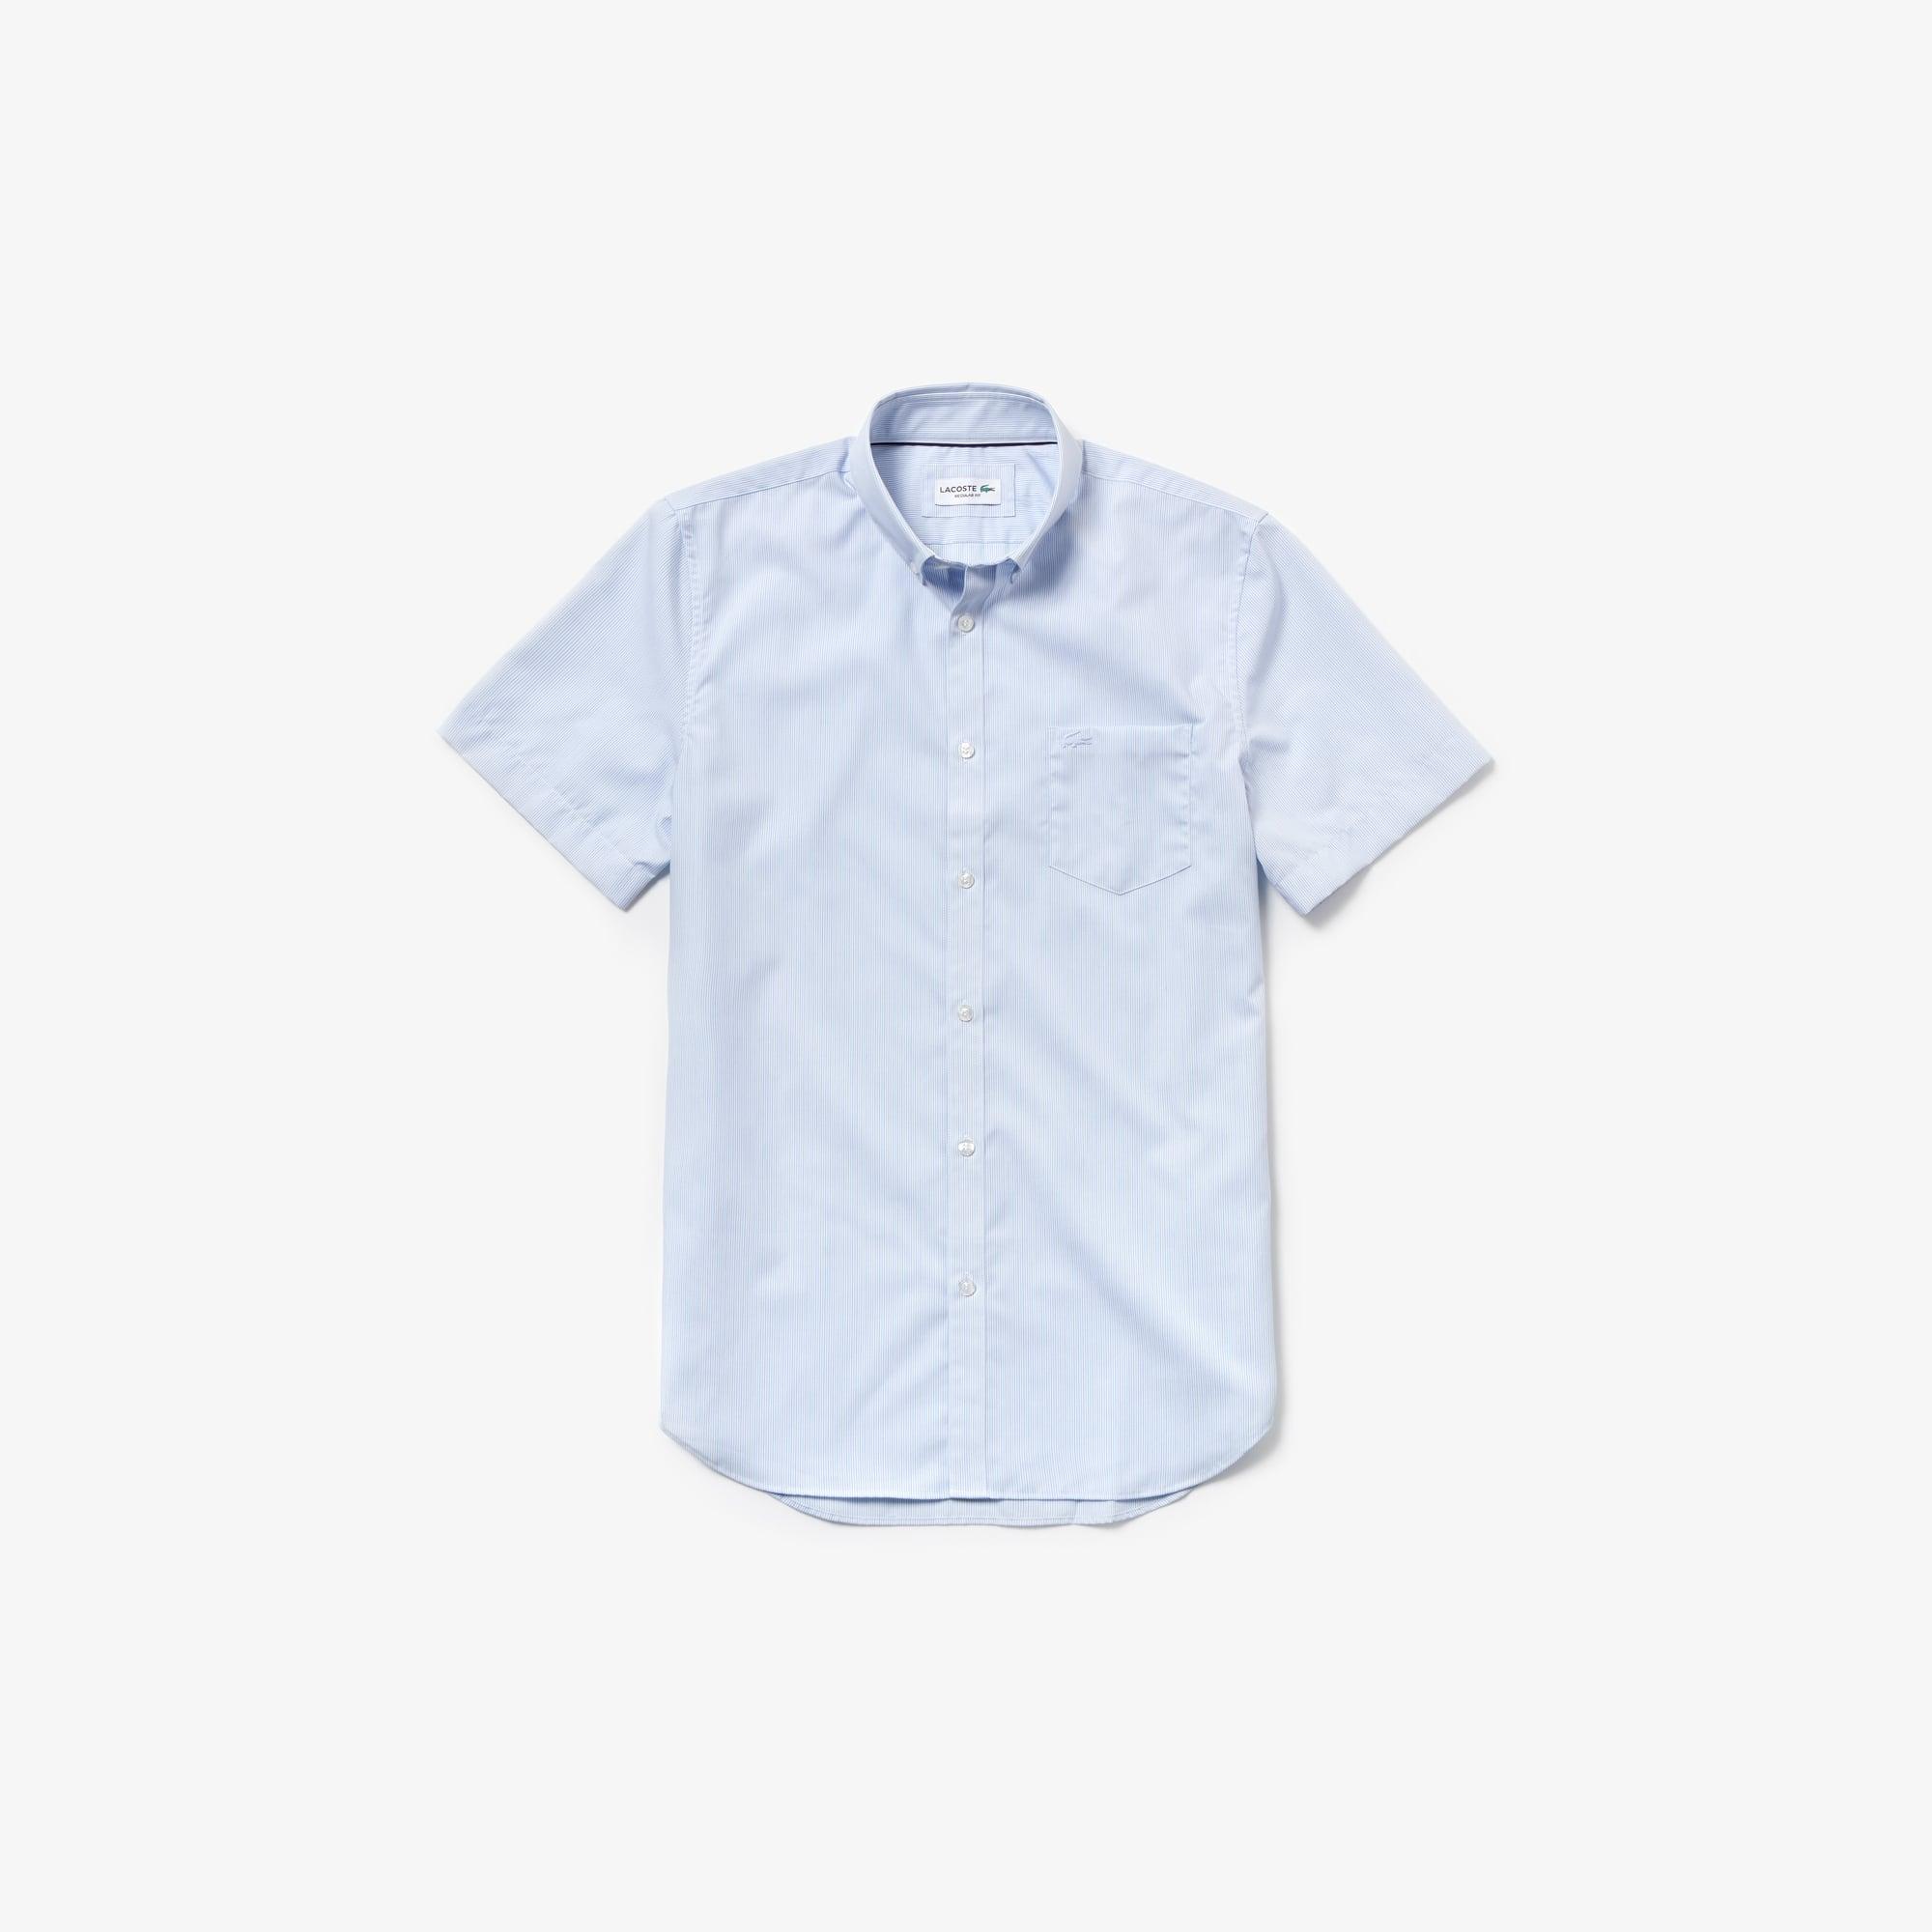 Camicia regular fit a maniche corte in popeline di cotone a righe